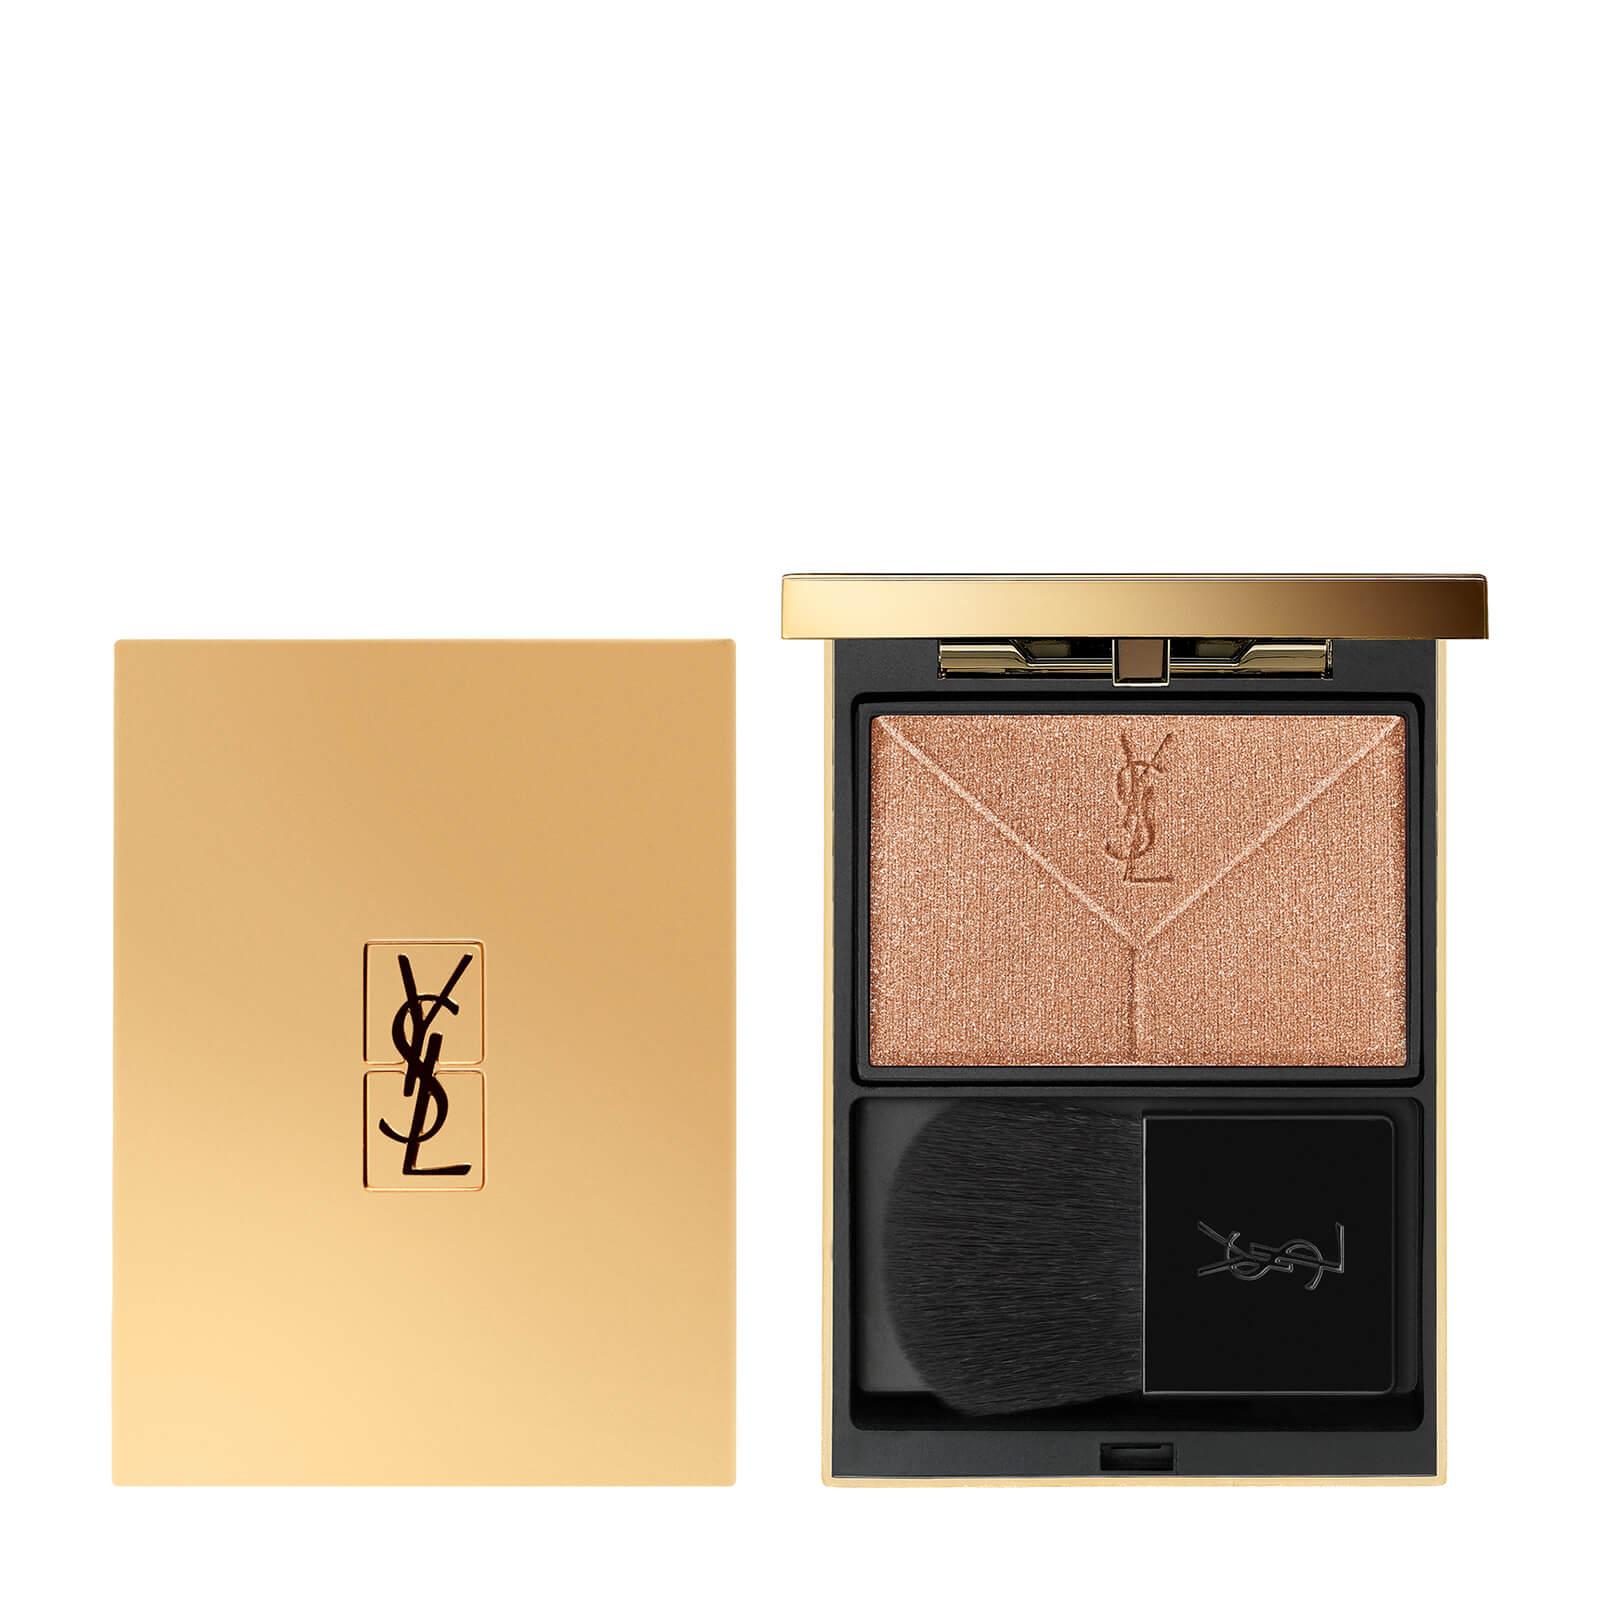 YSL Couture Highlighter Yves Saint Laurent 3g (différentes teintes disponibles) - Or Bronze Intemporel